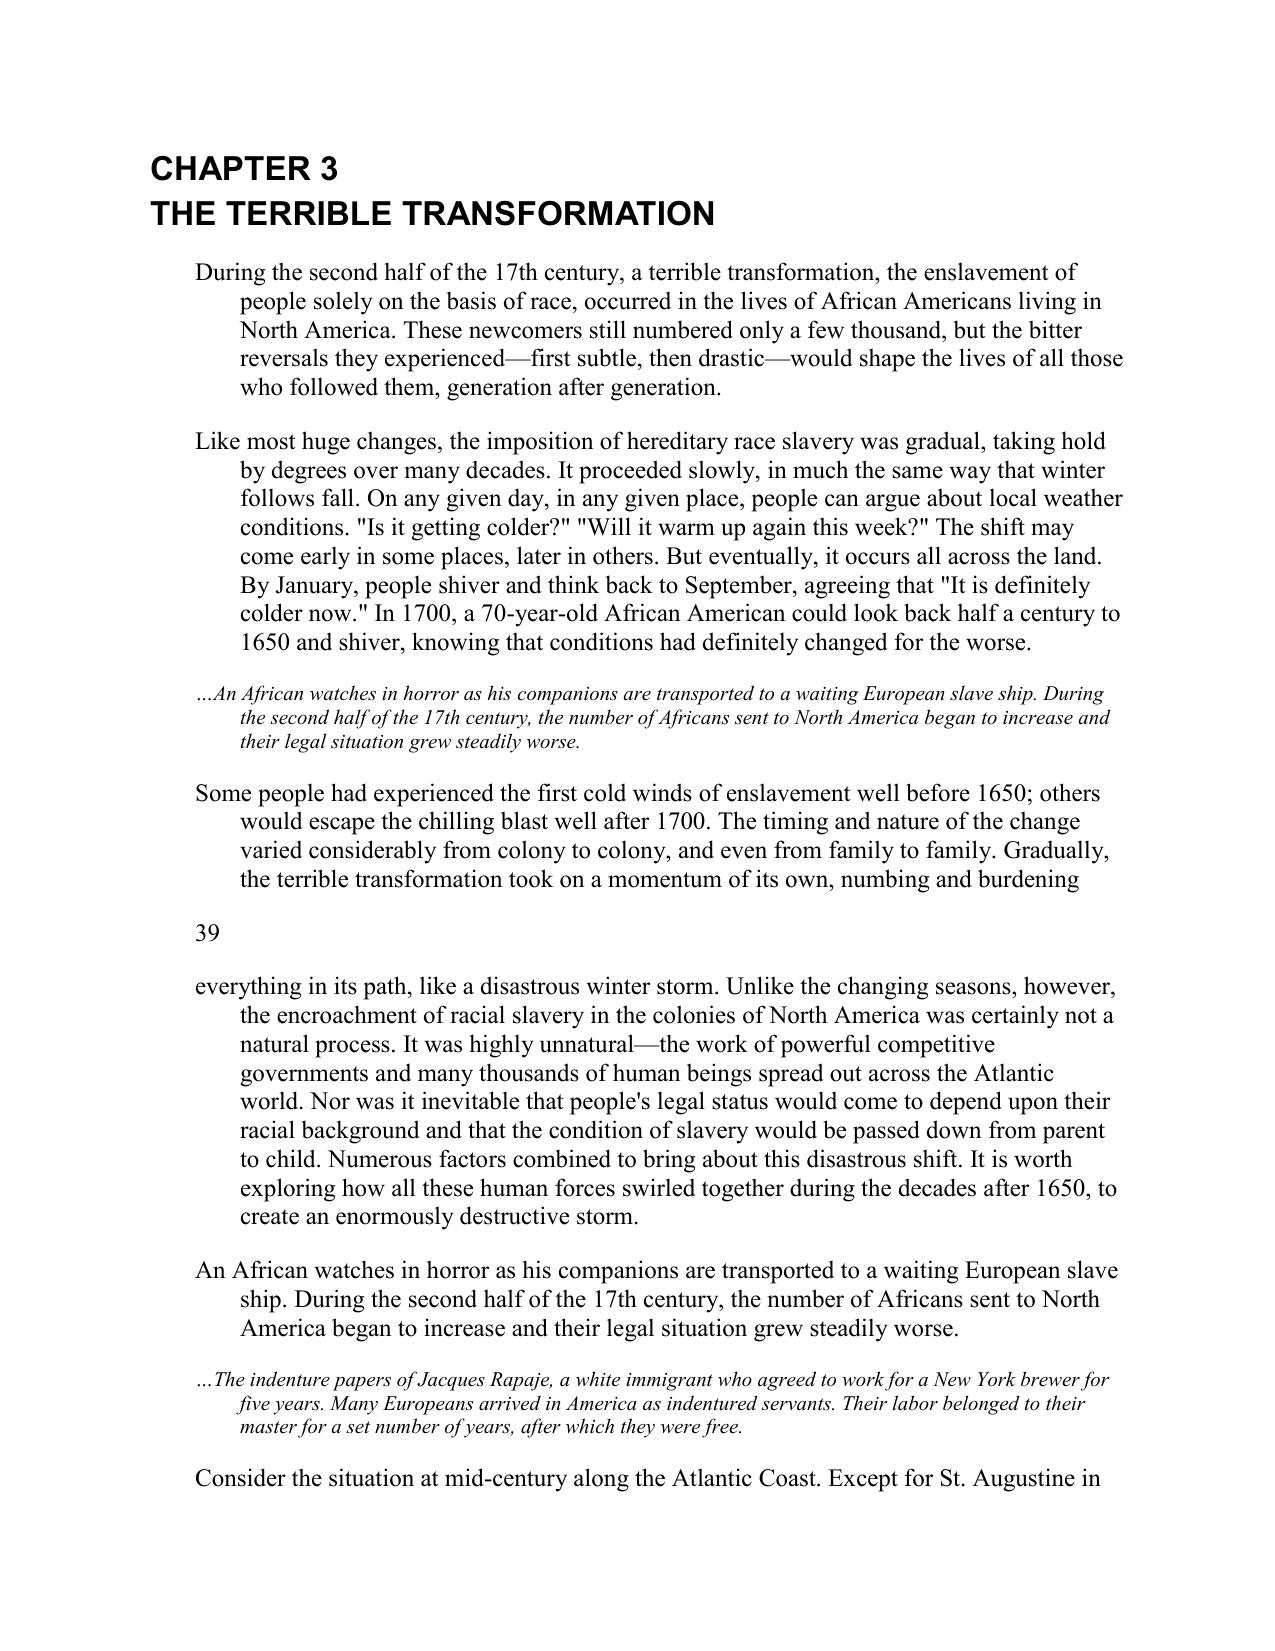 terrible transformation quizlet